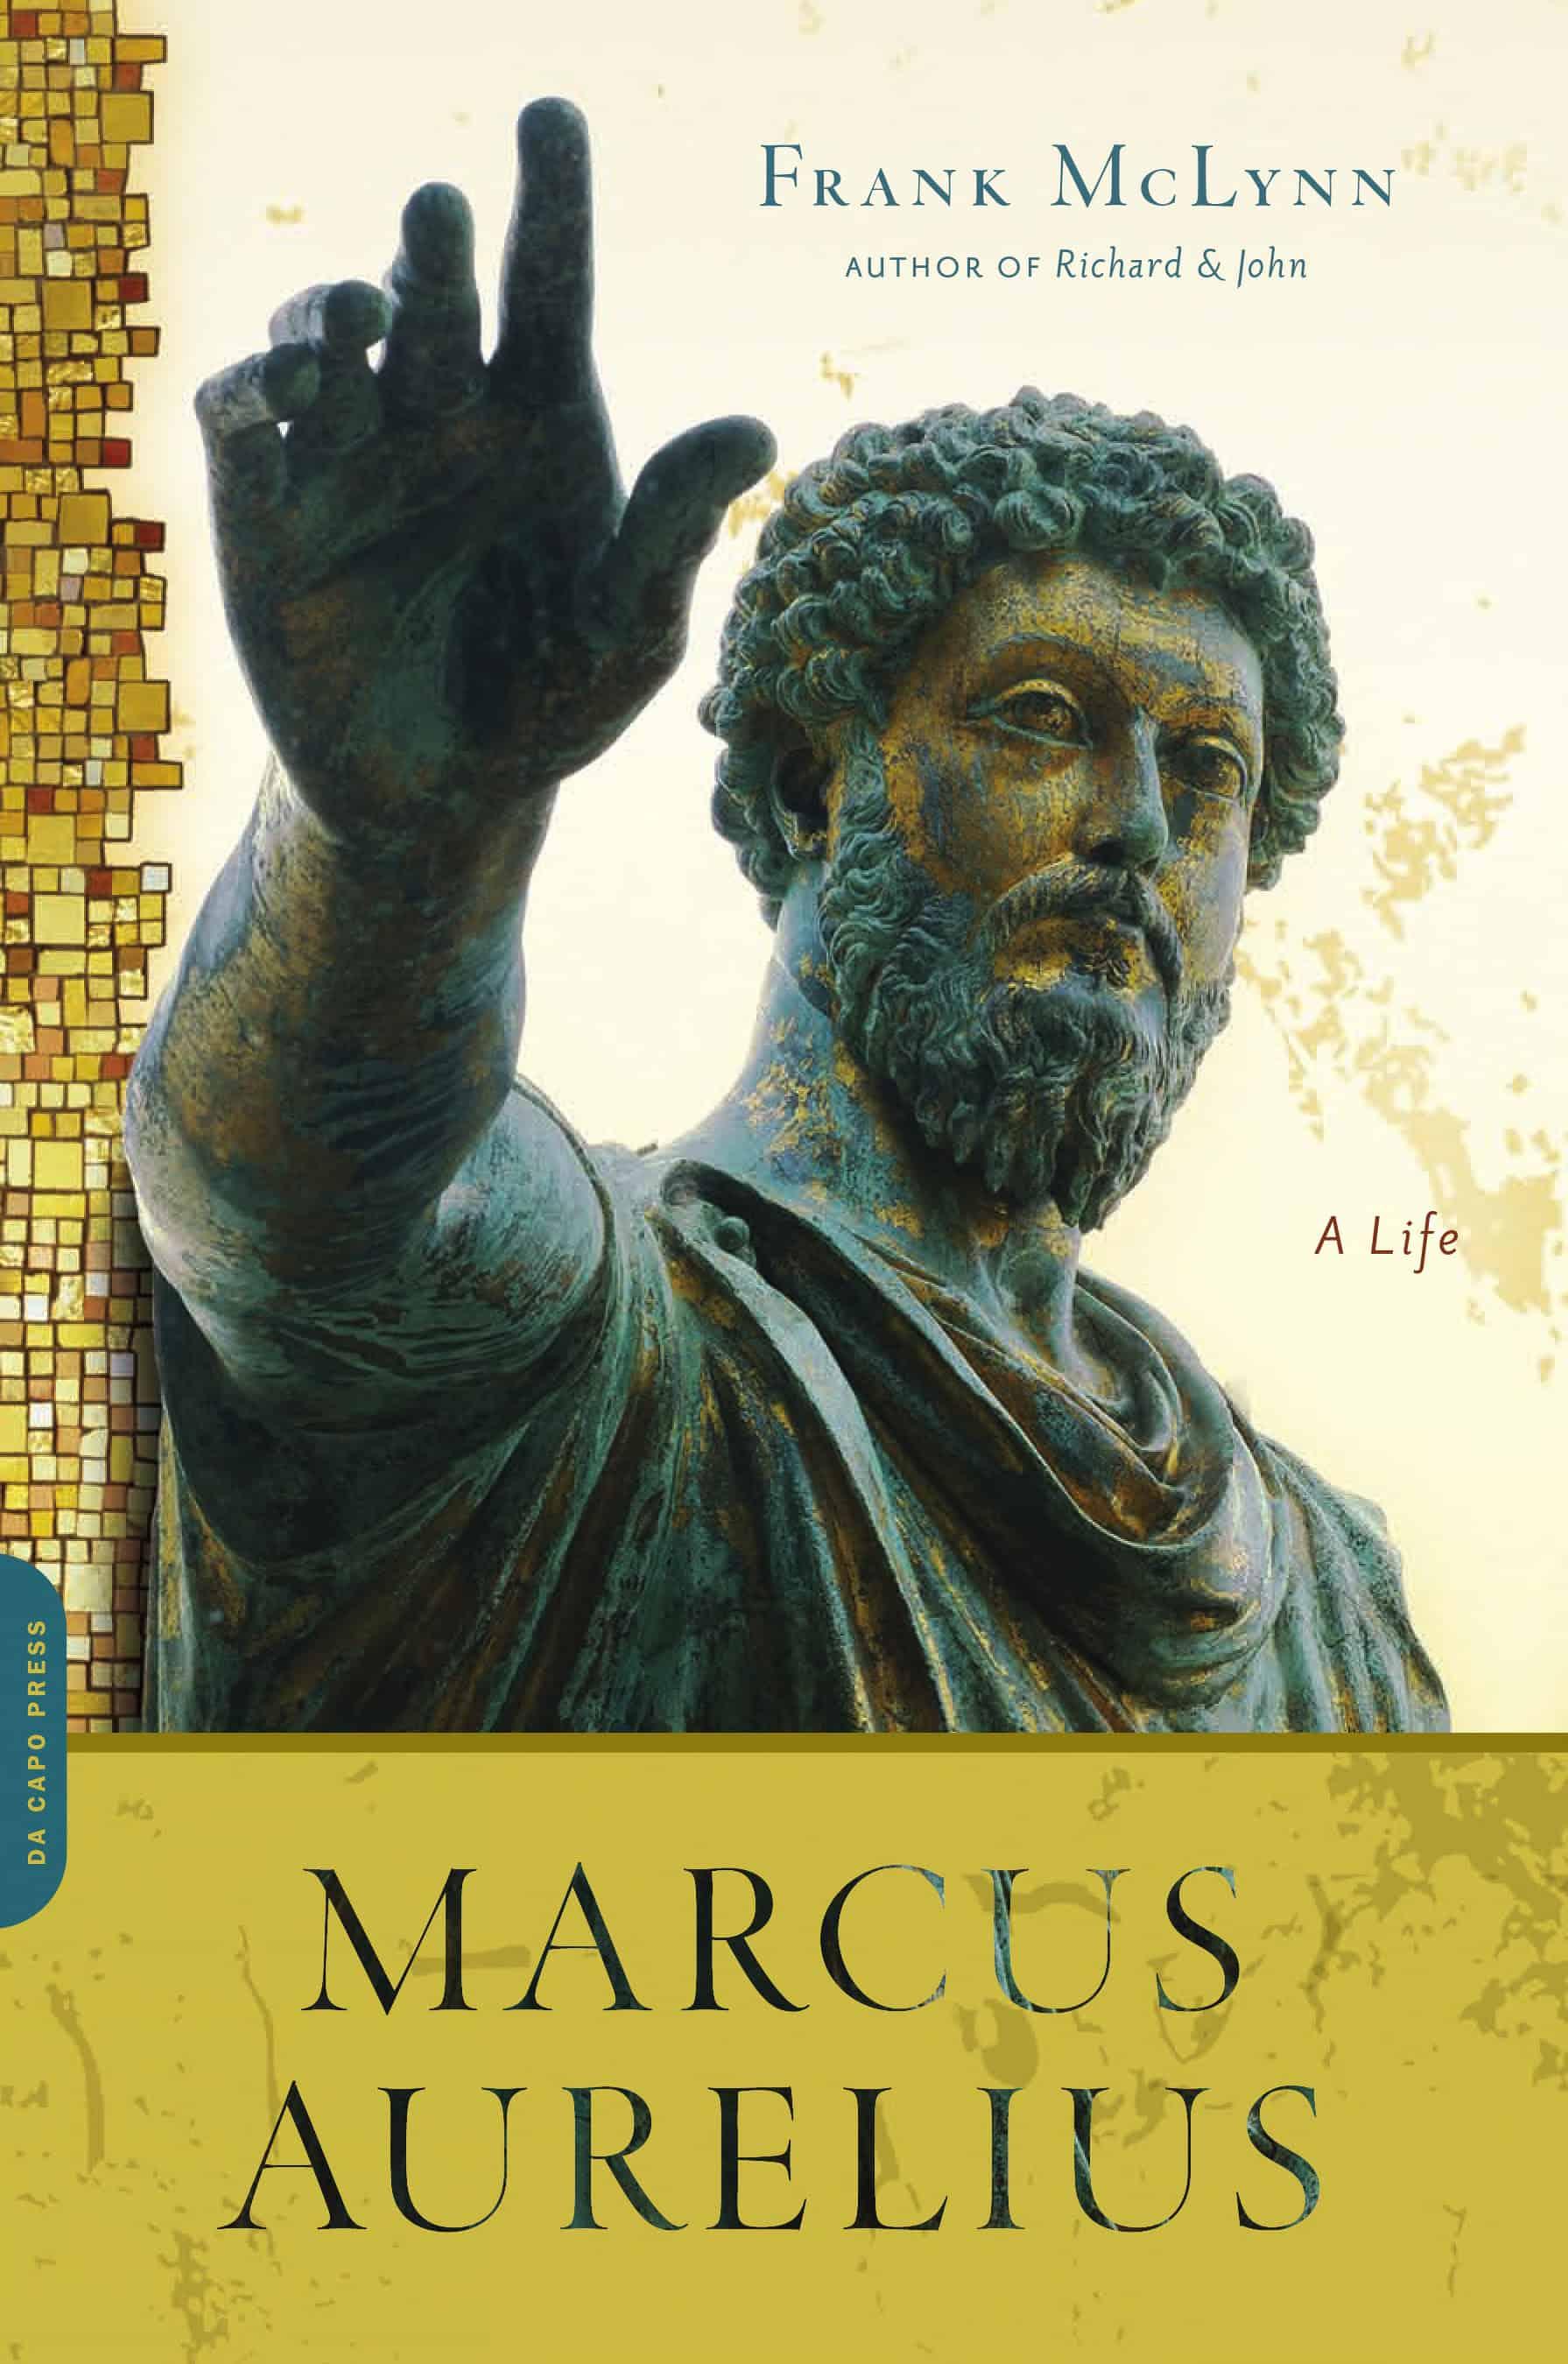 Marcus Aurelius A Life 1 - Marcus Aurelius: A Life